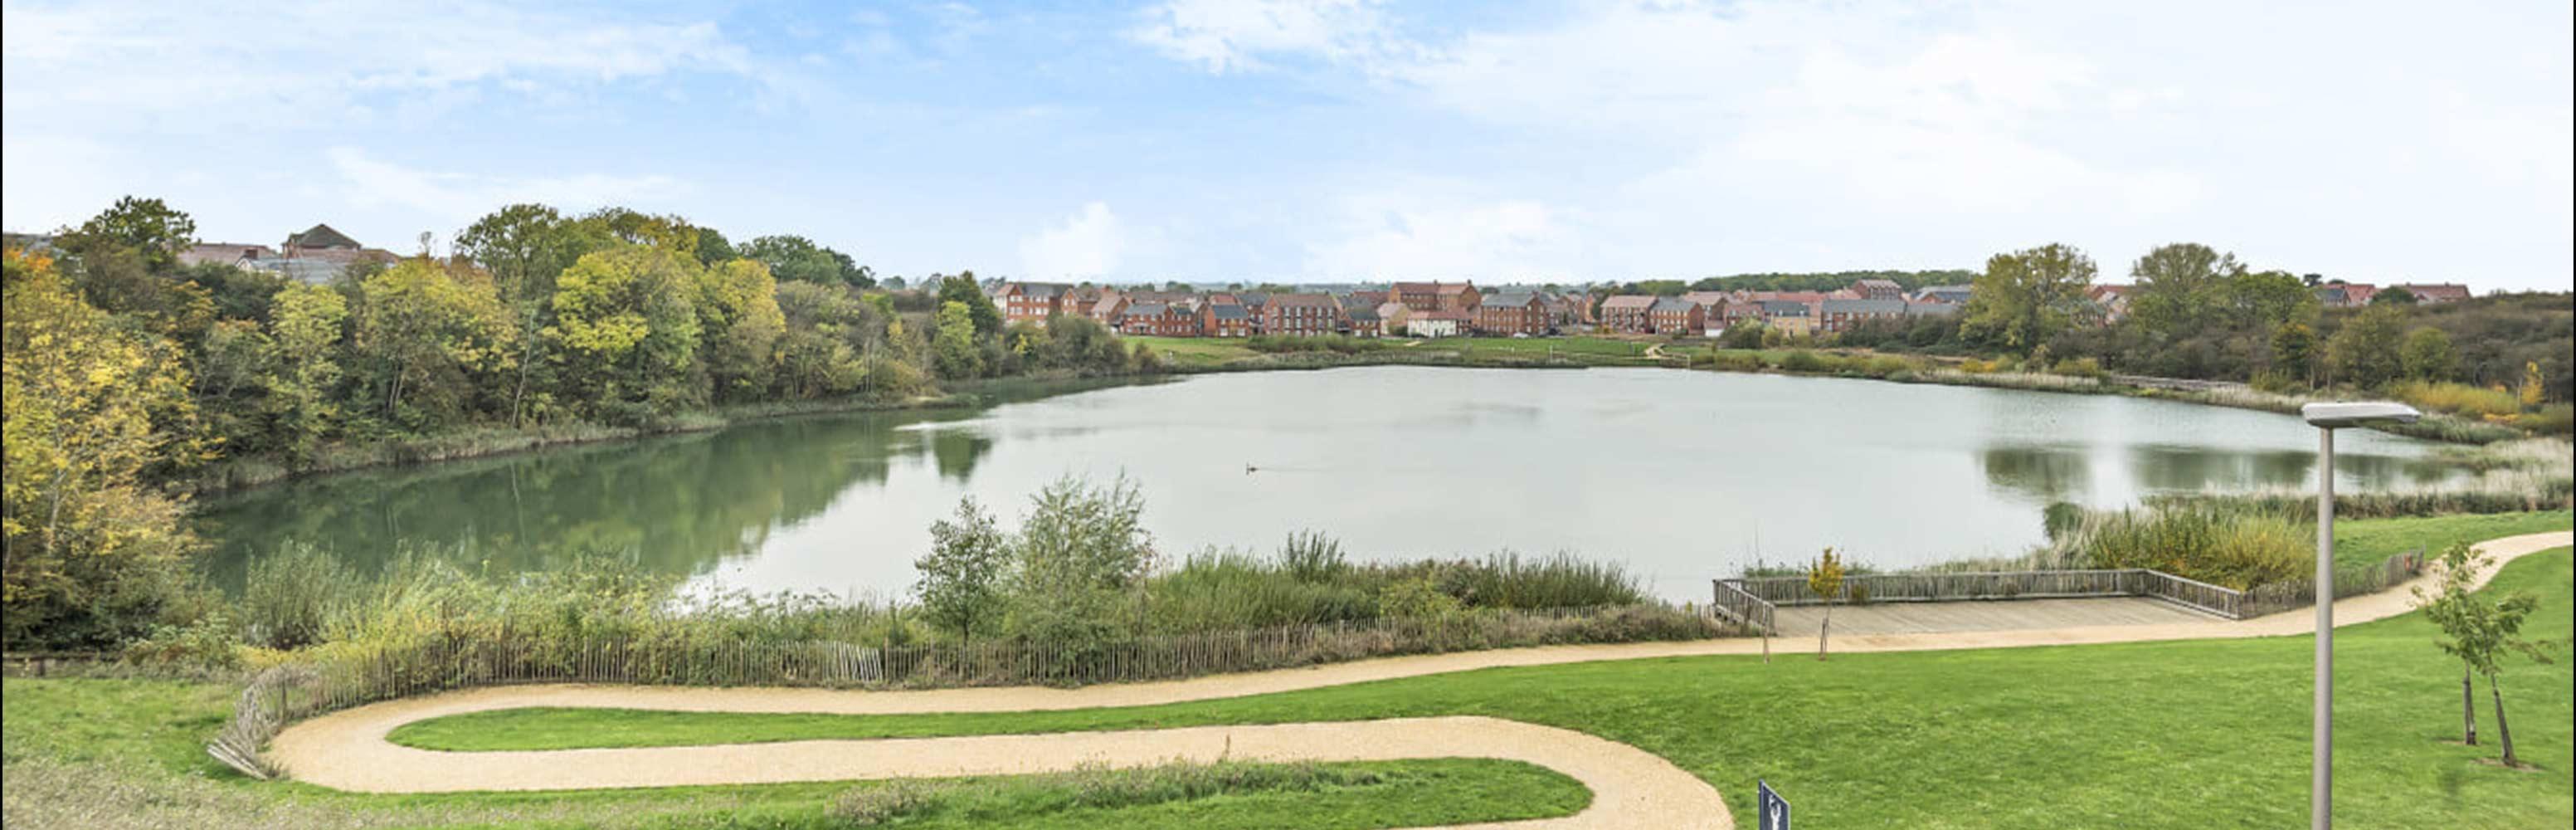 Milton Keynes Landscape